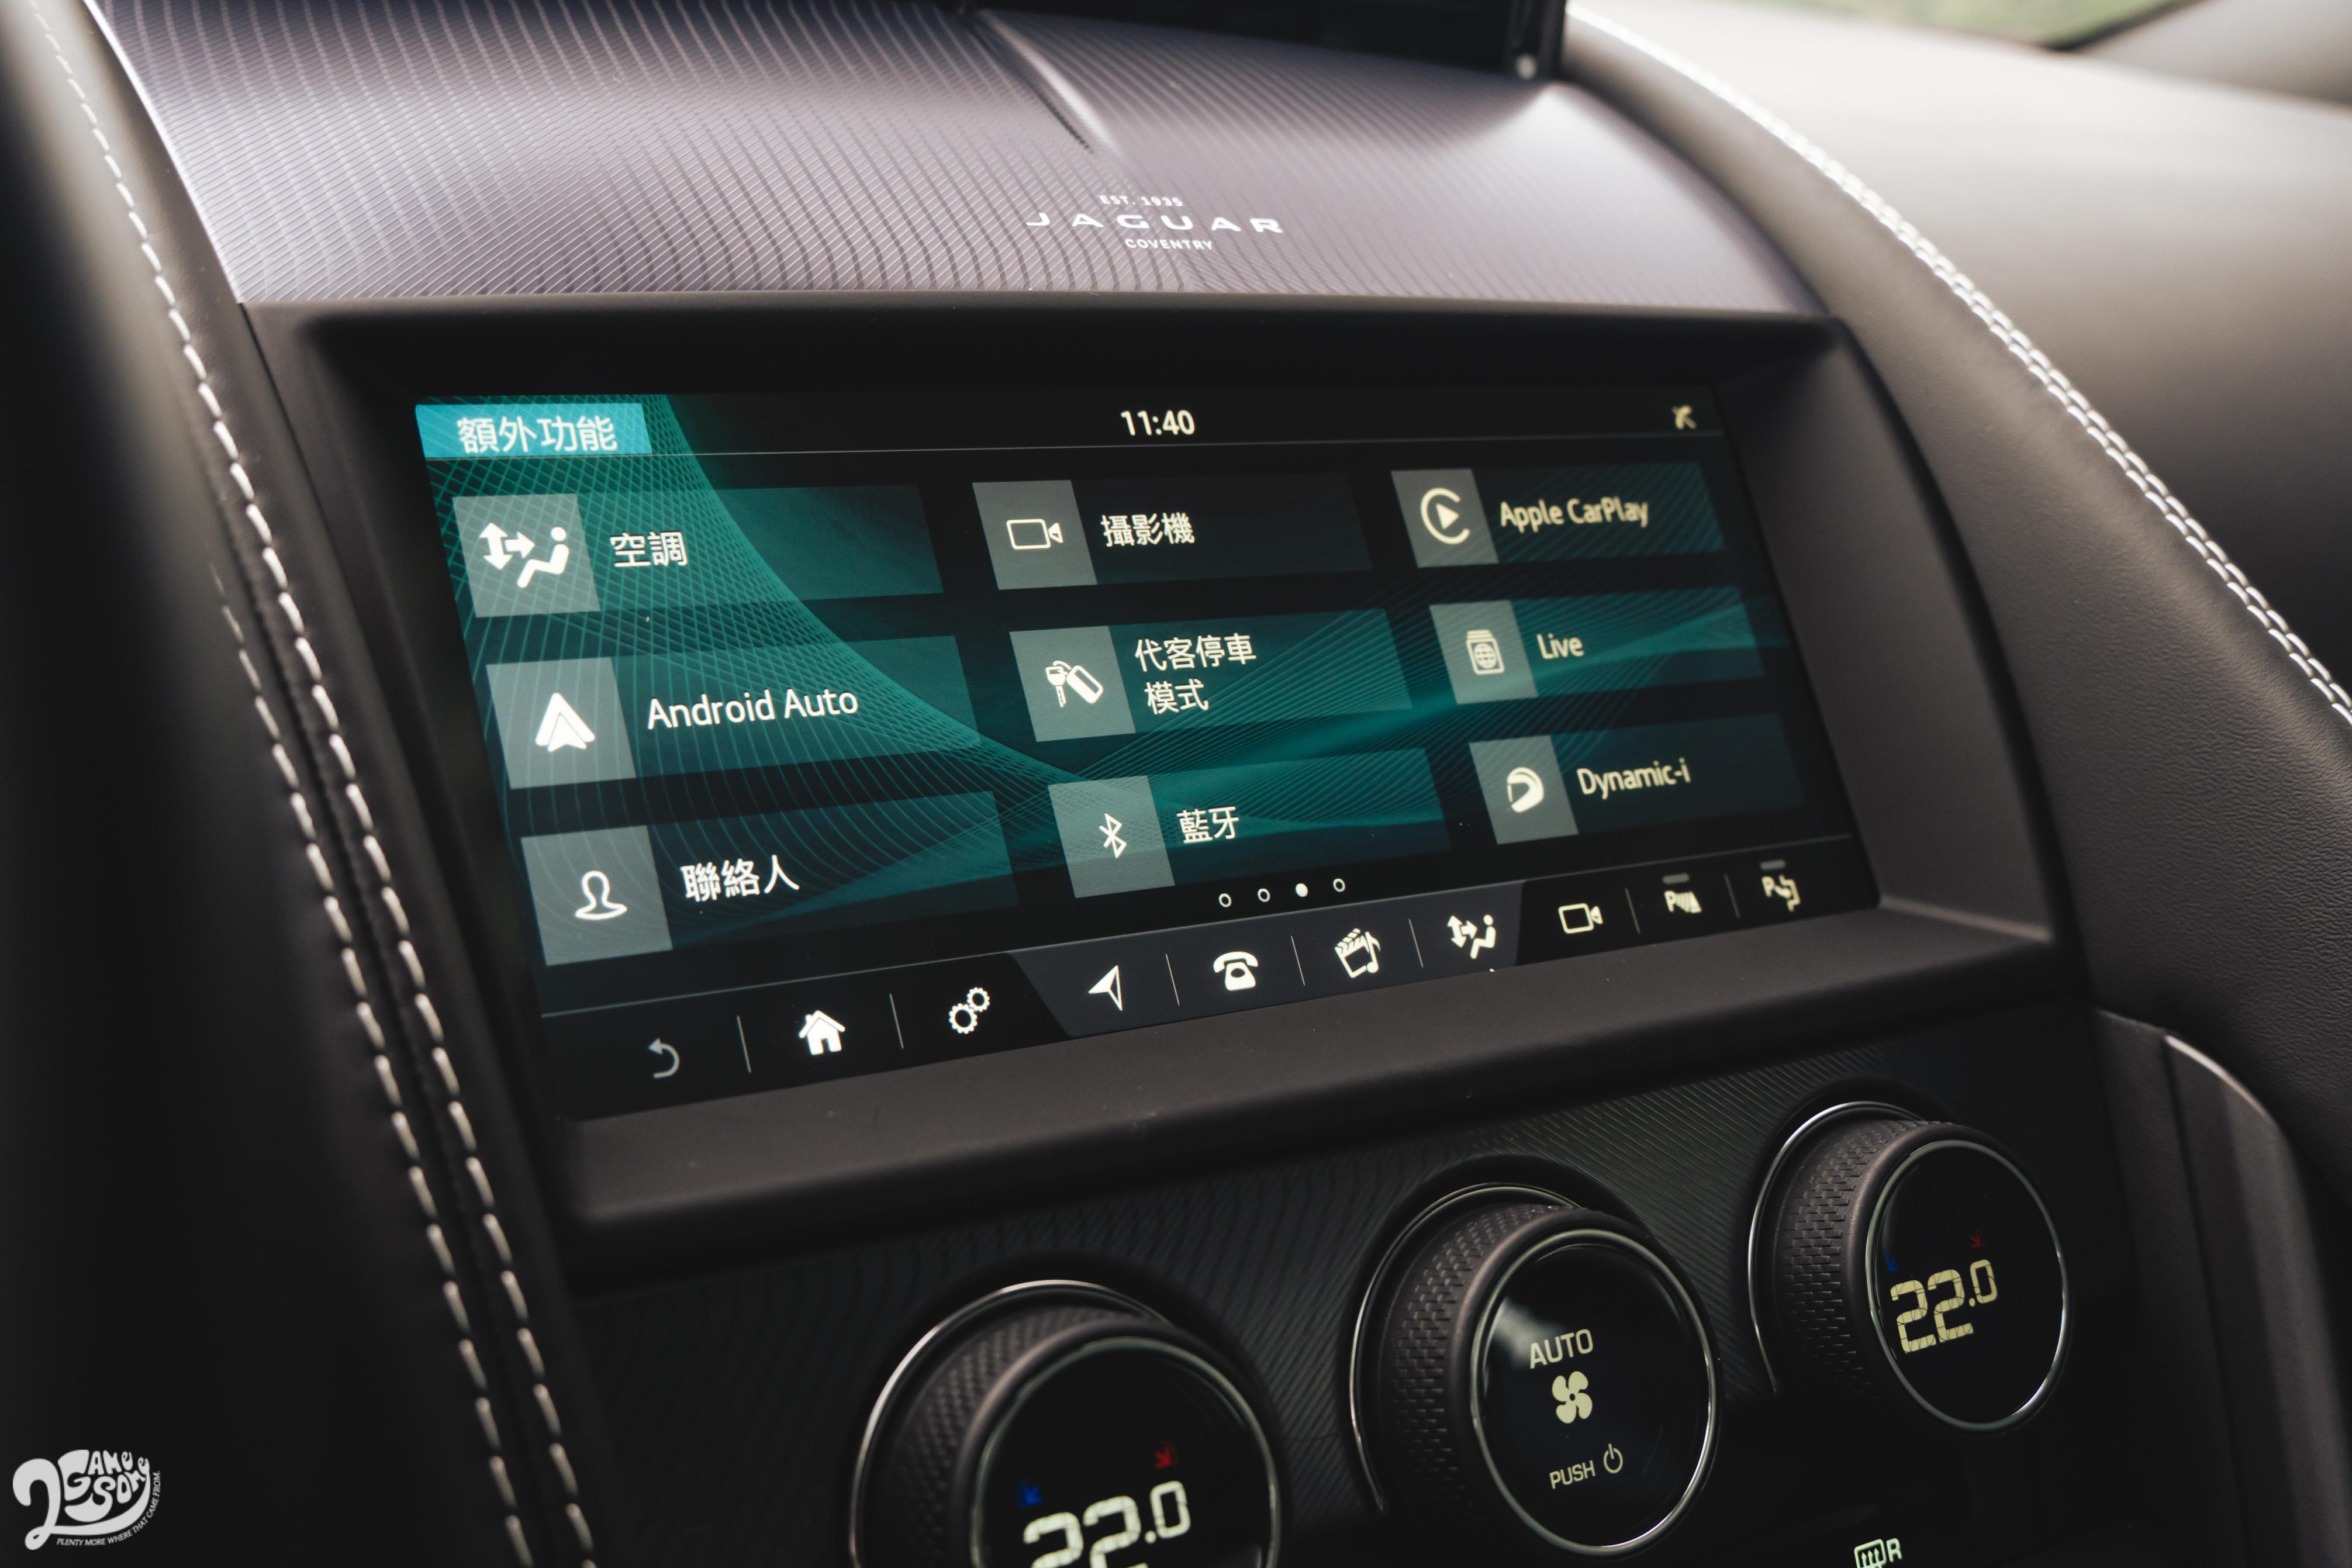 10 吋中央觸控螢幕支援 Apple CarPlay、Android Auto。